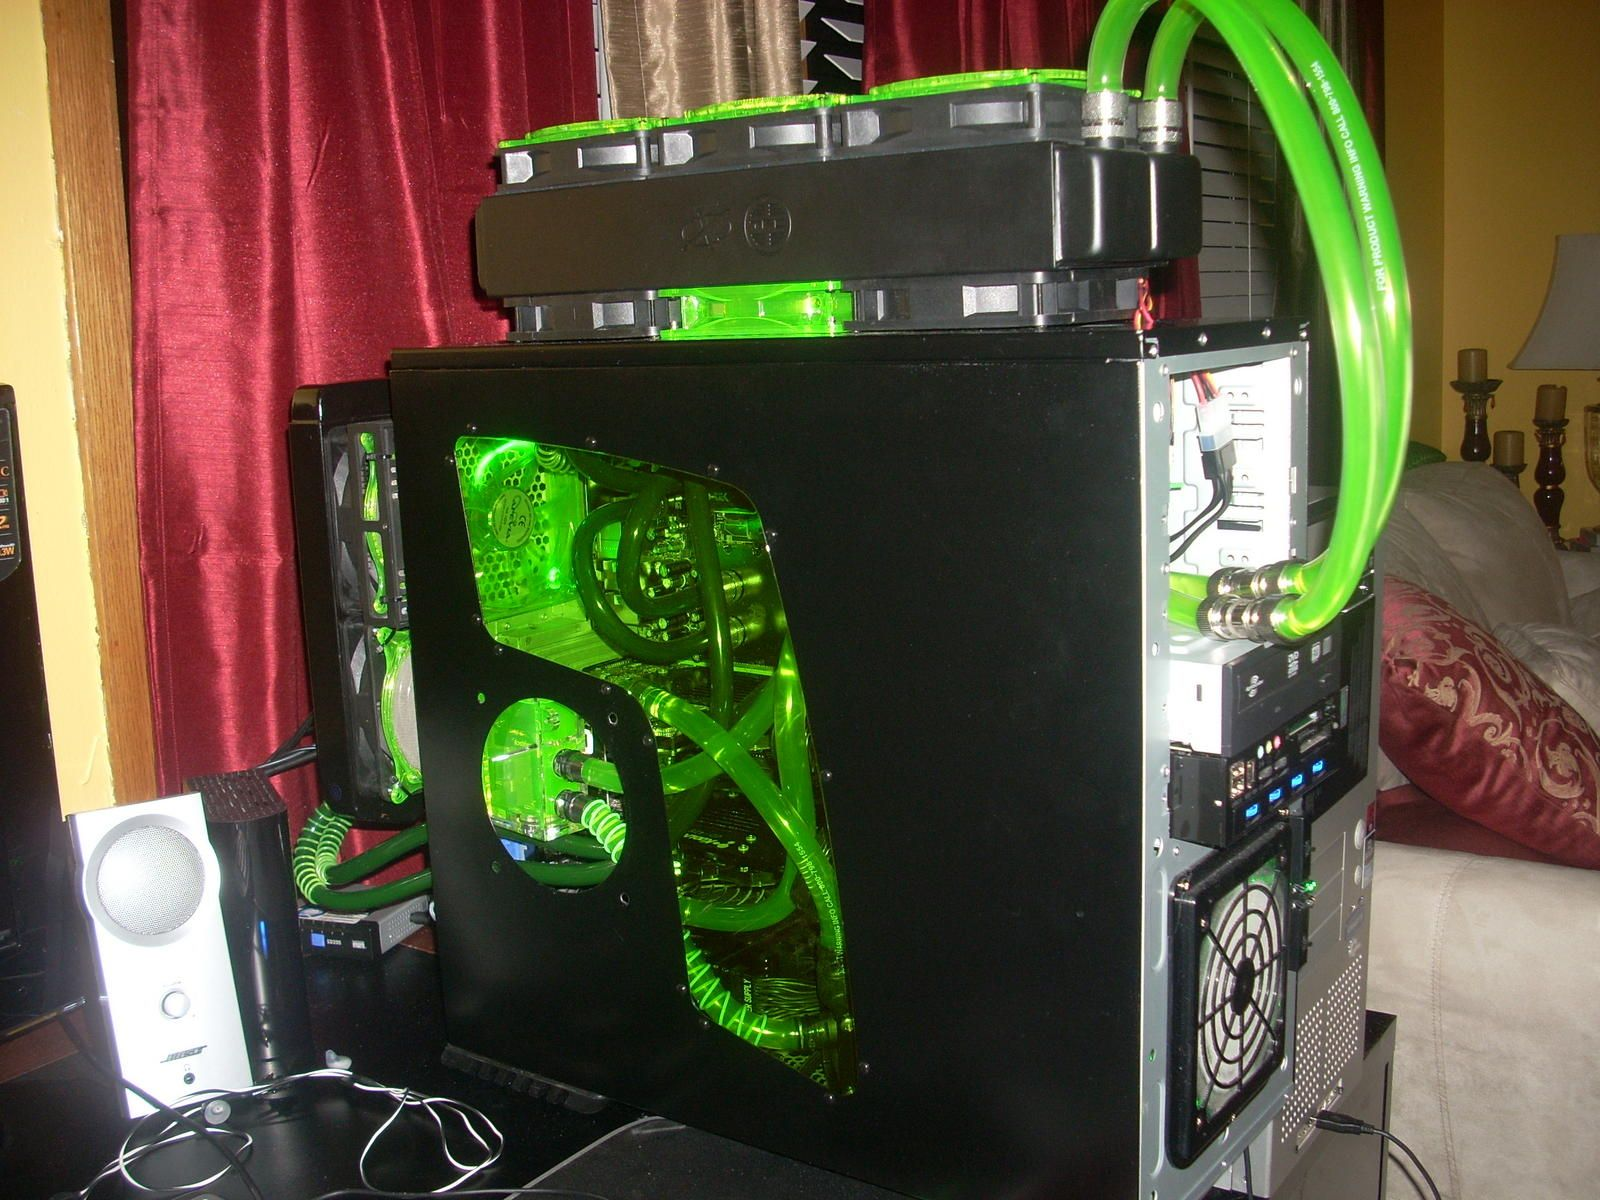 computer cases liquid cooled computer cases a prebuilt water cooled computer case. Black Bedroom Furniture Sets. Home Design Ideas